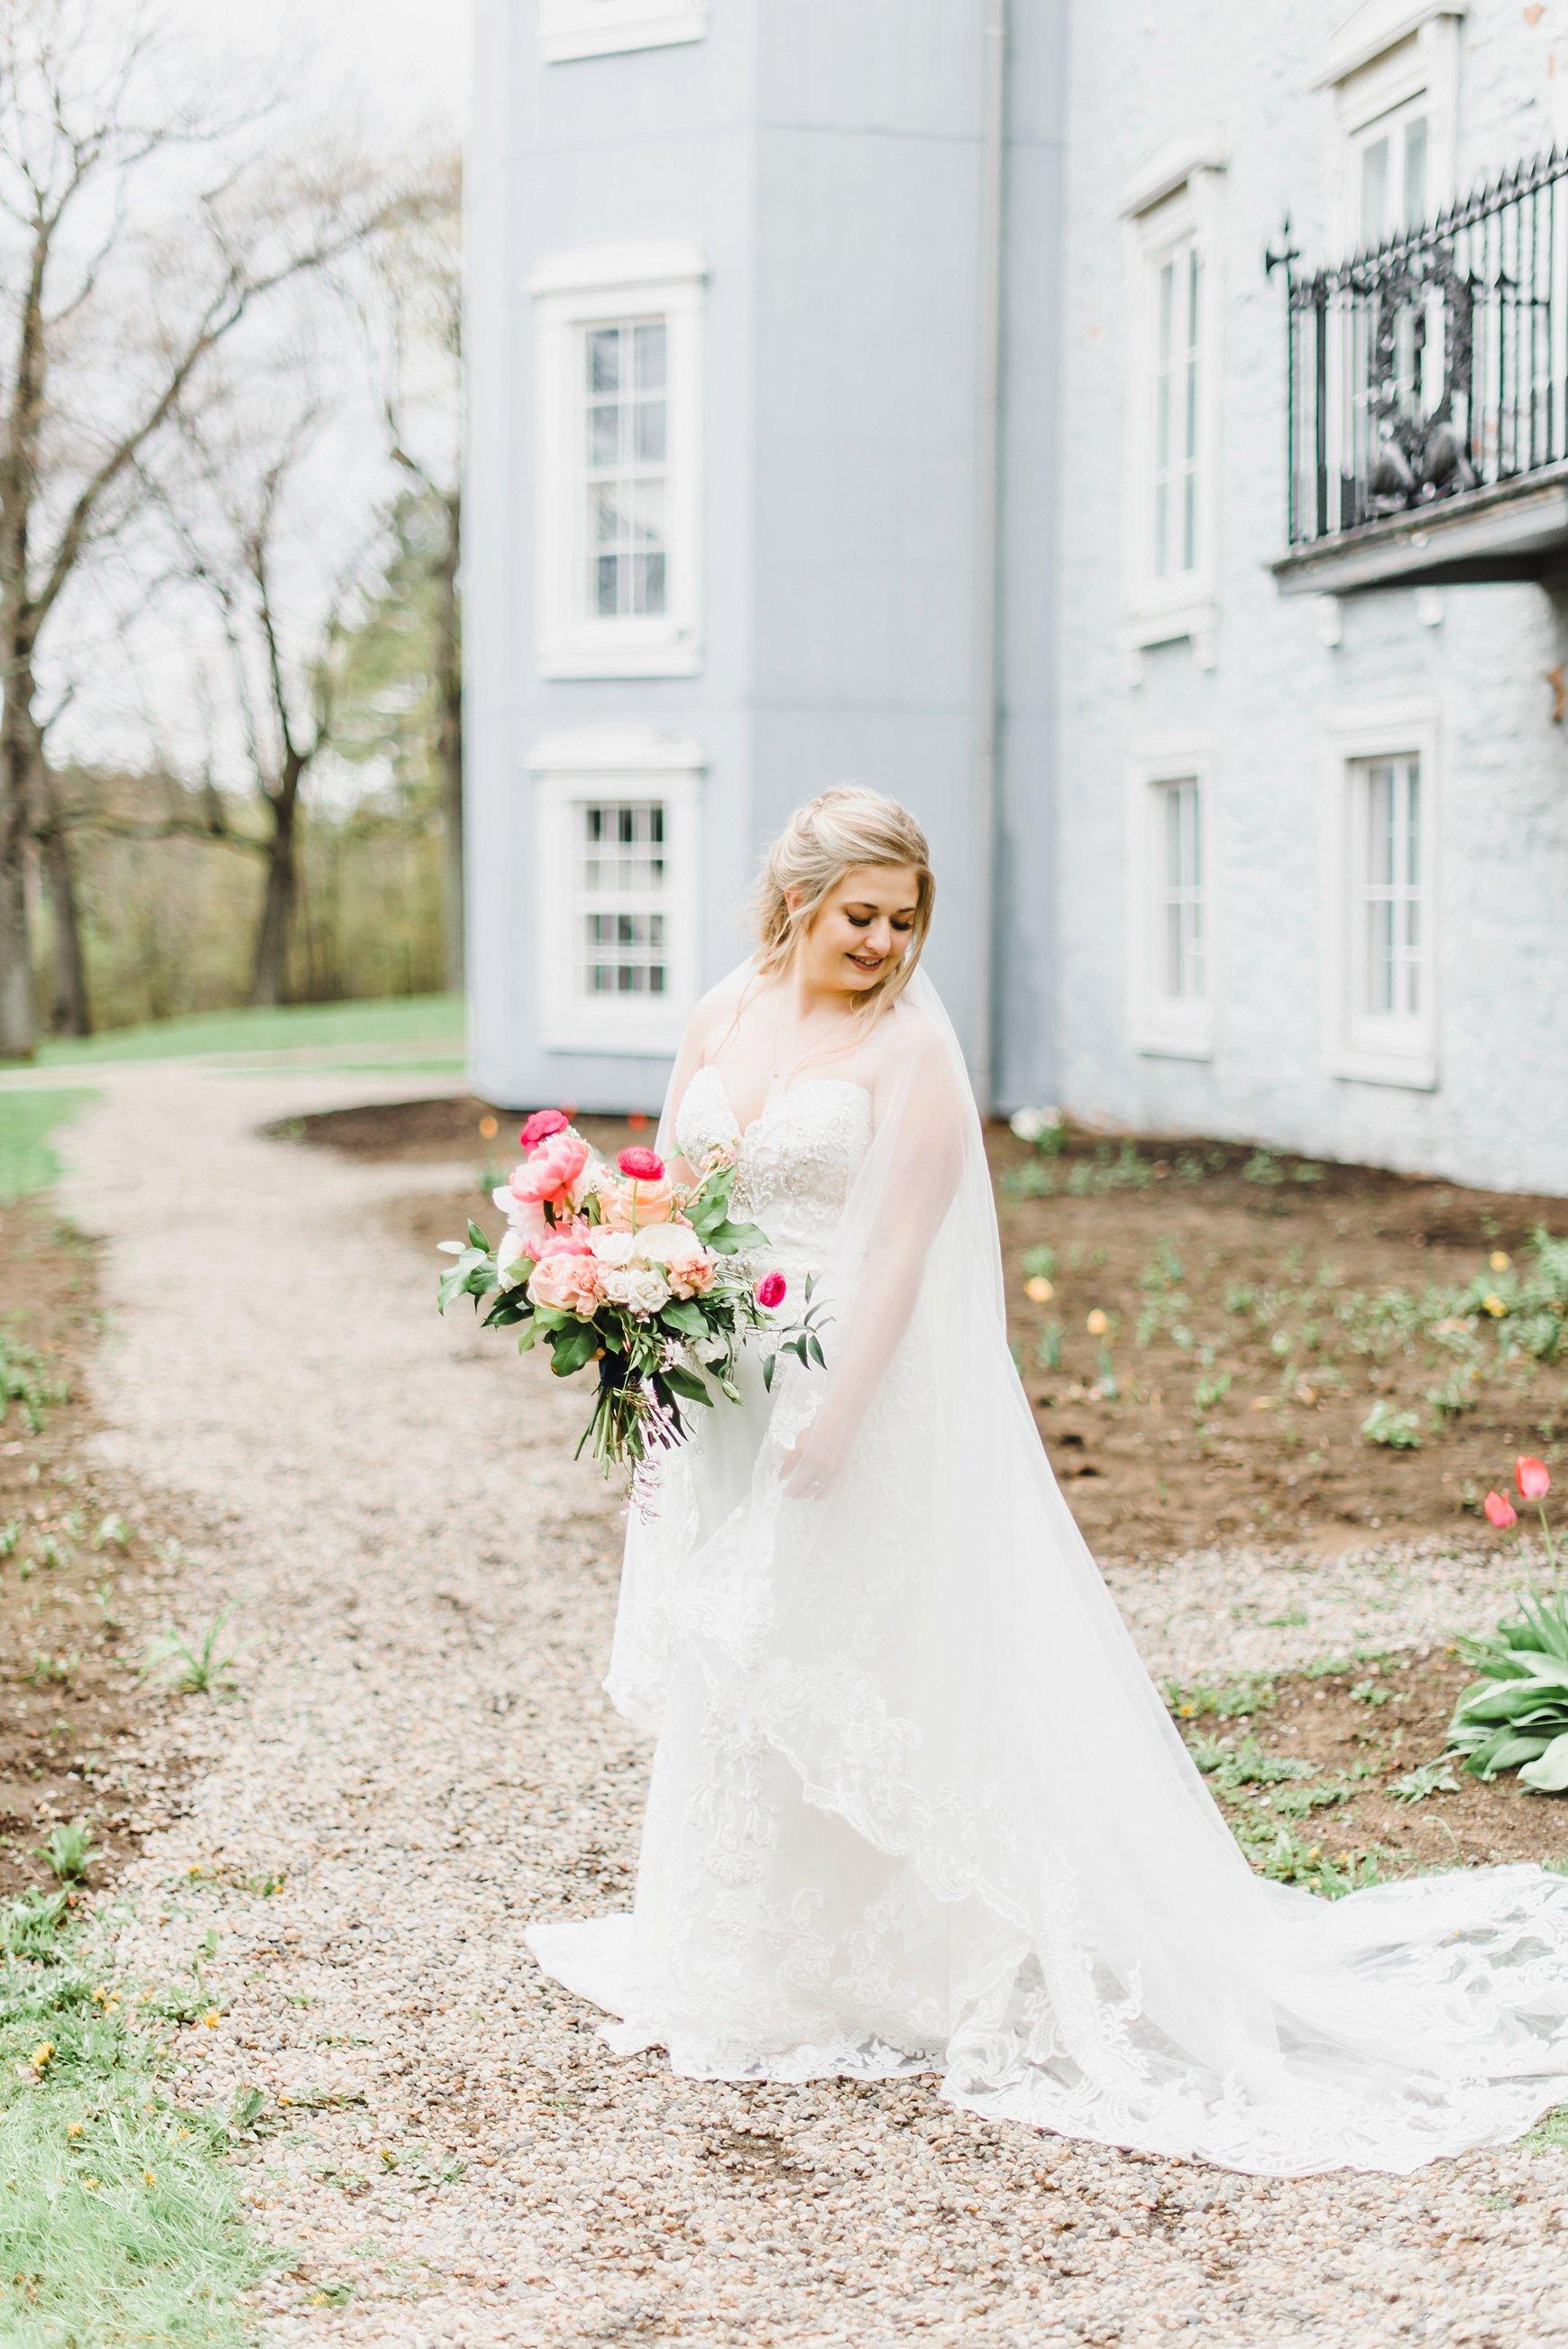 light airy indie fine art ottawa wedding photographer | Ali and Batoul Photography_0192.jpg